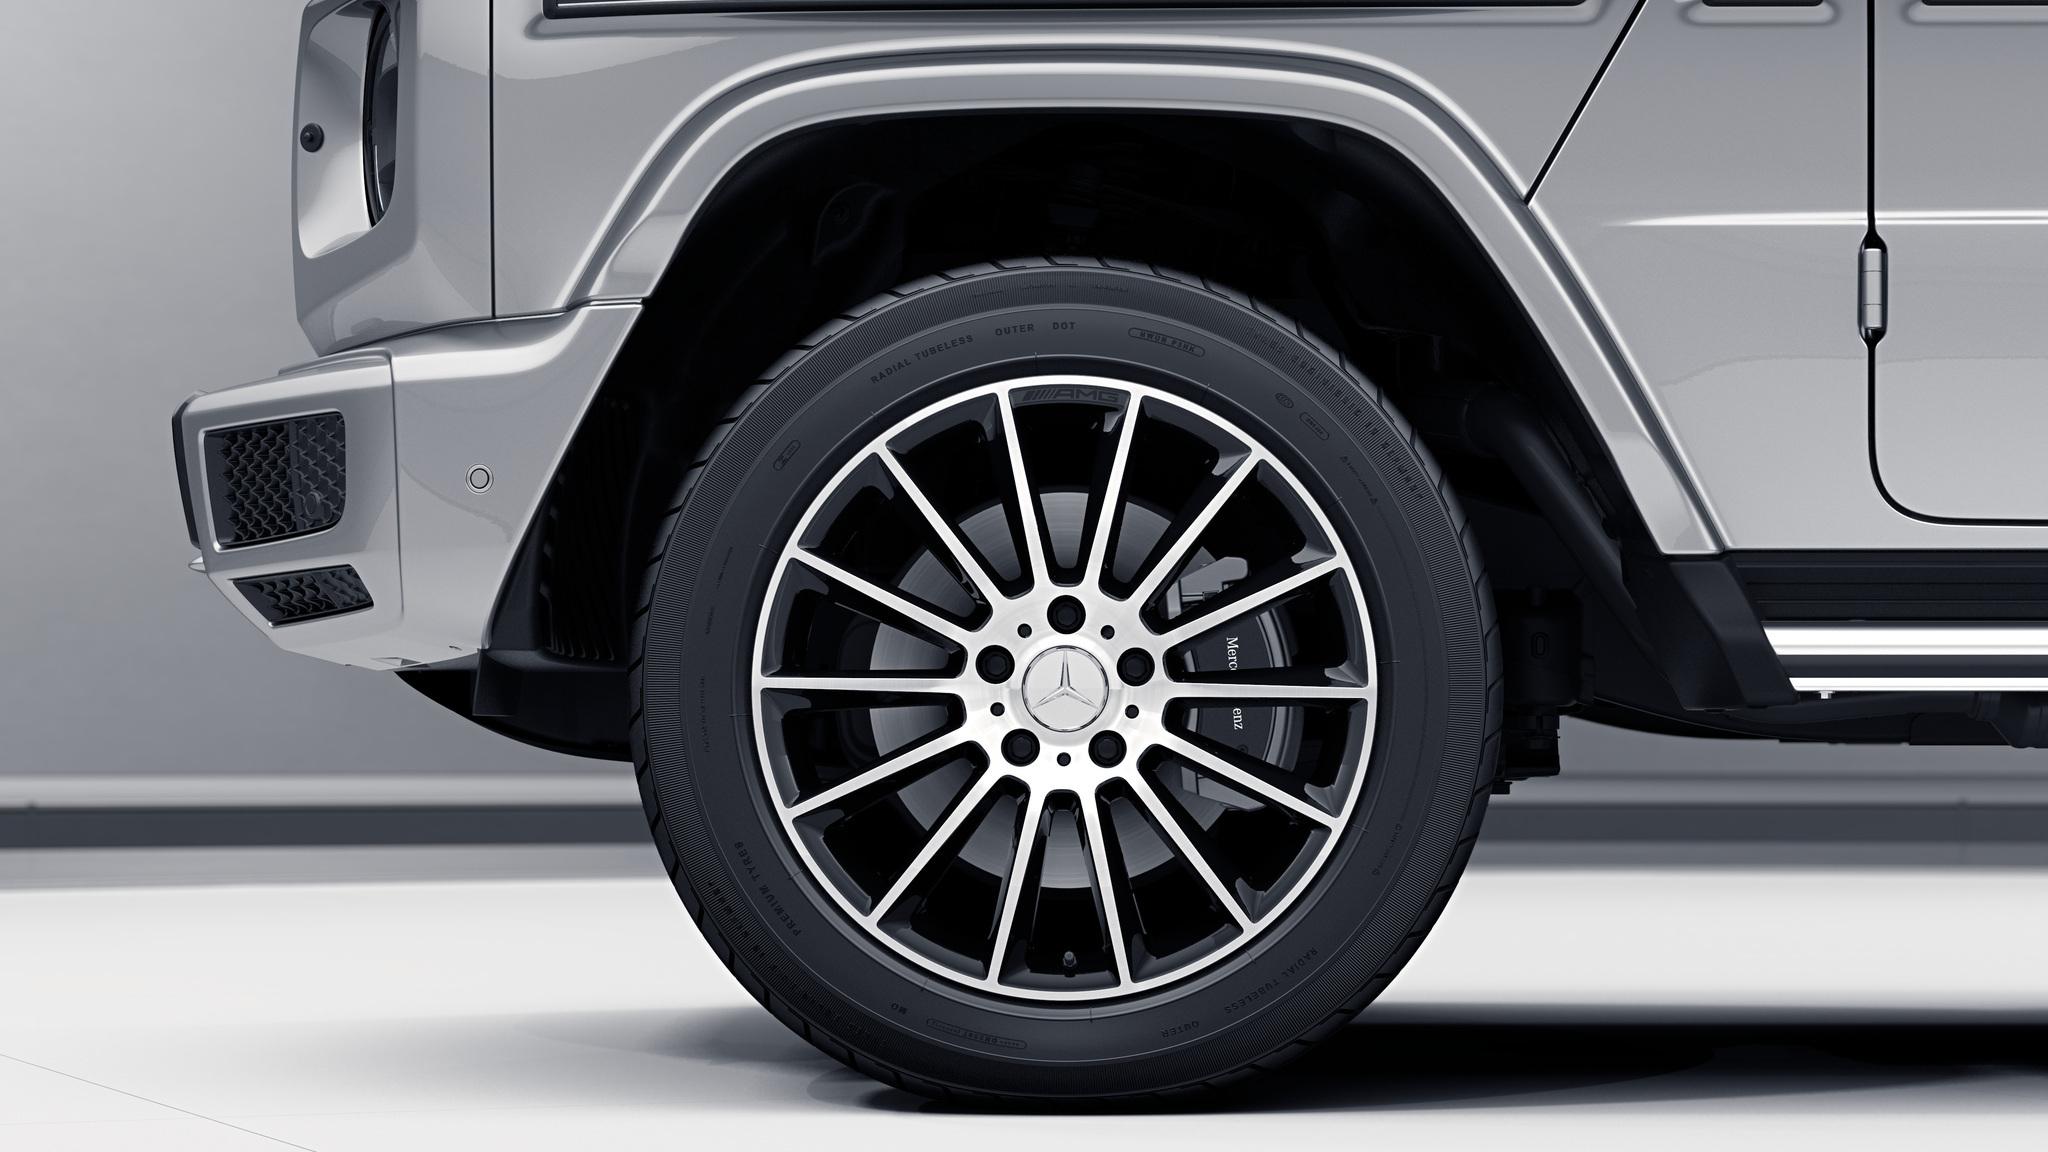 Jantes AMG 20 multibranches de la Mercedes-Benz Classe G